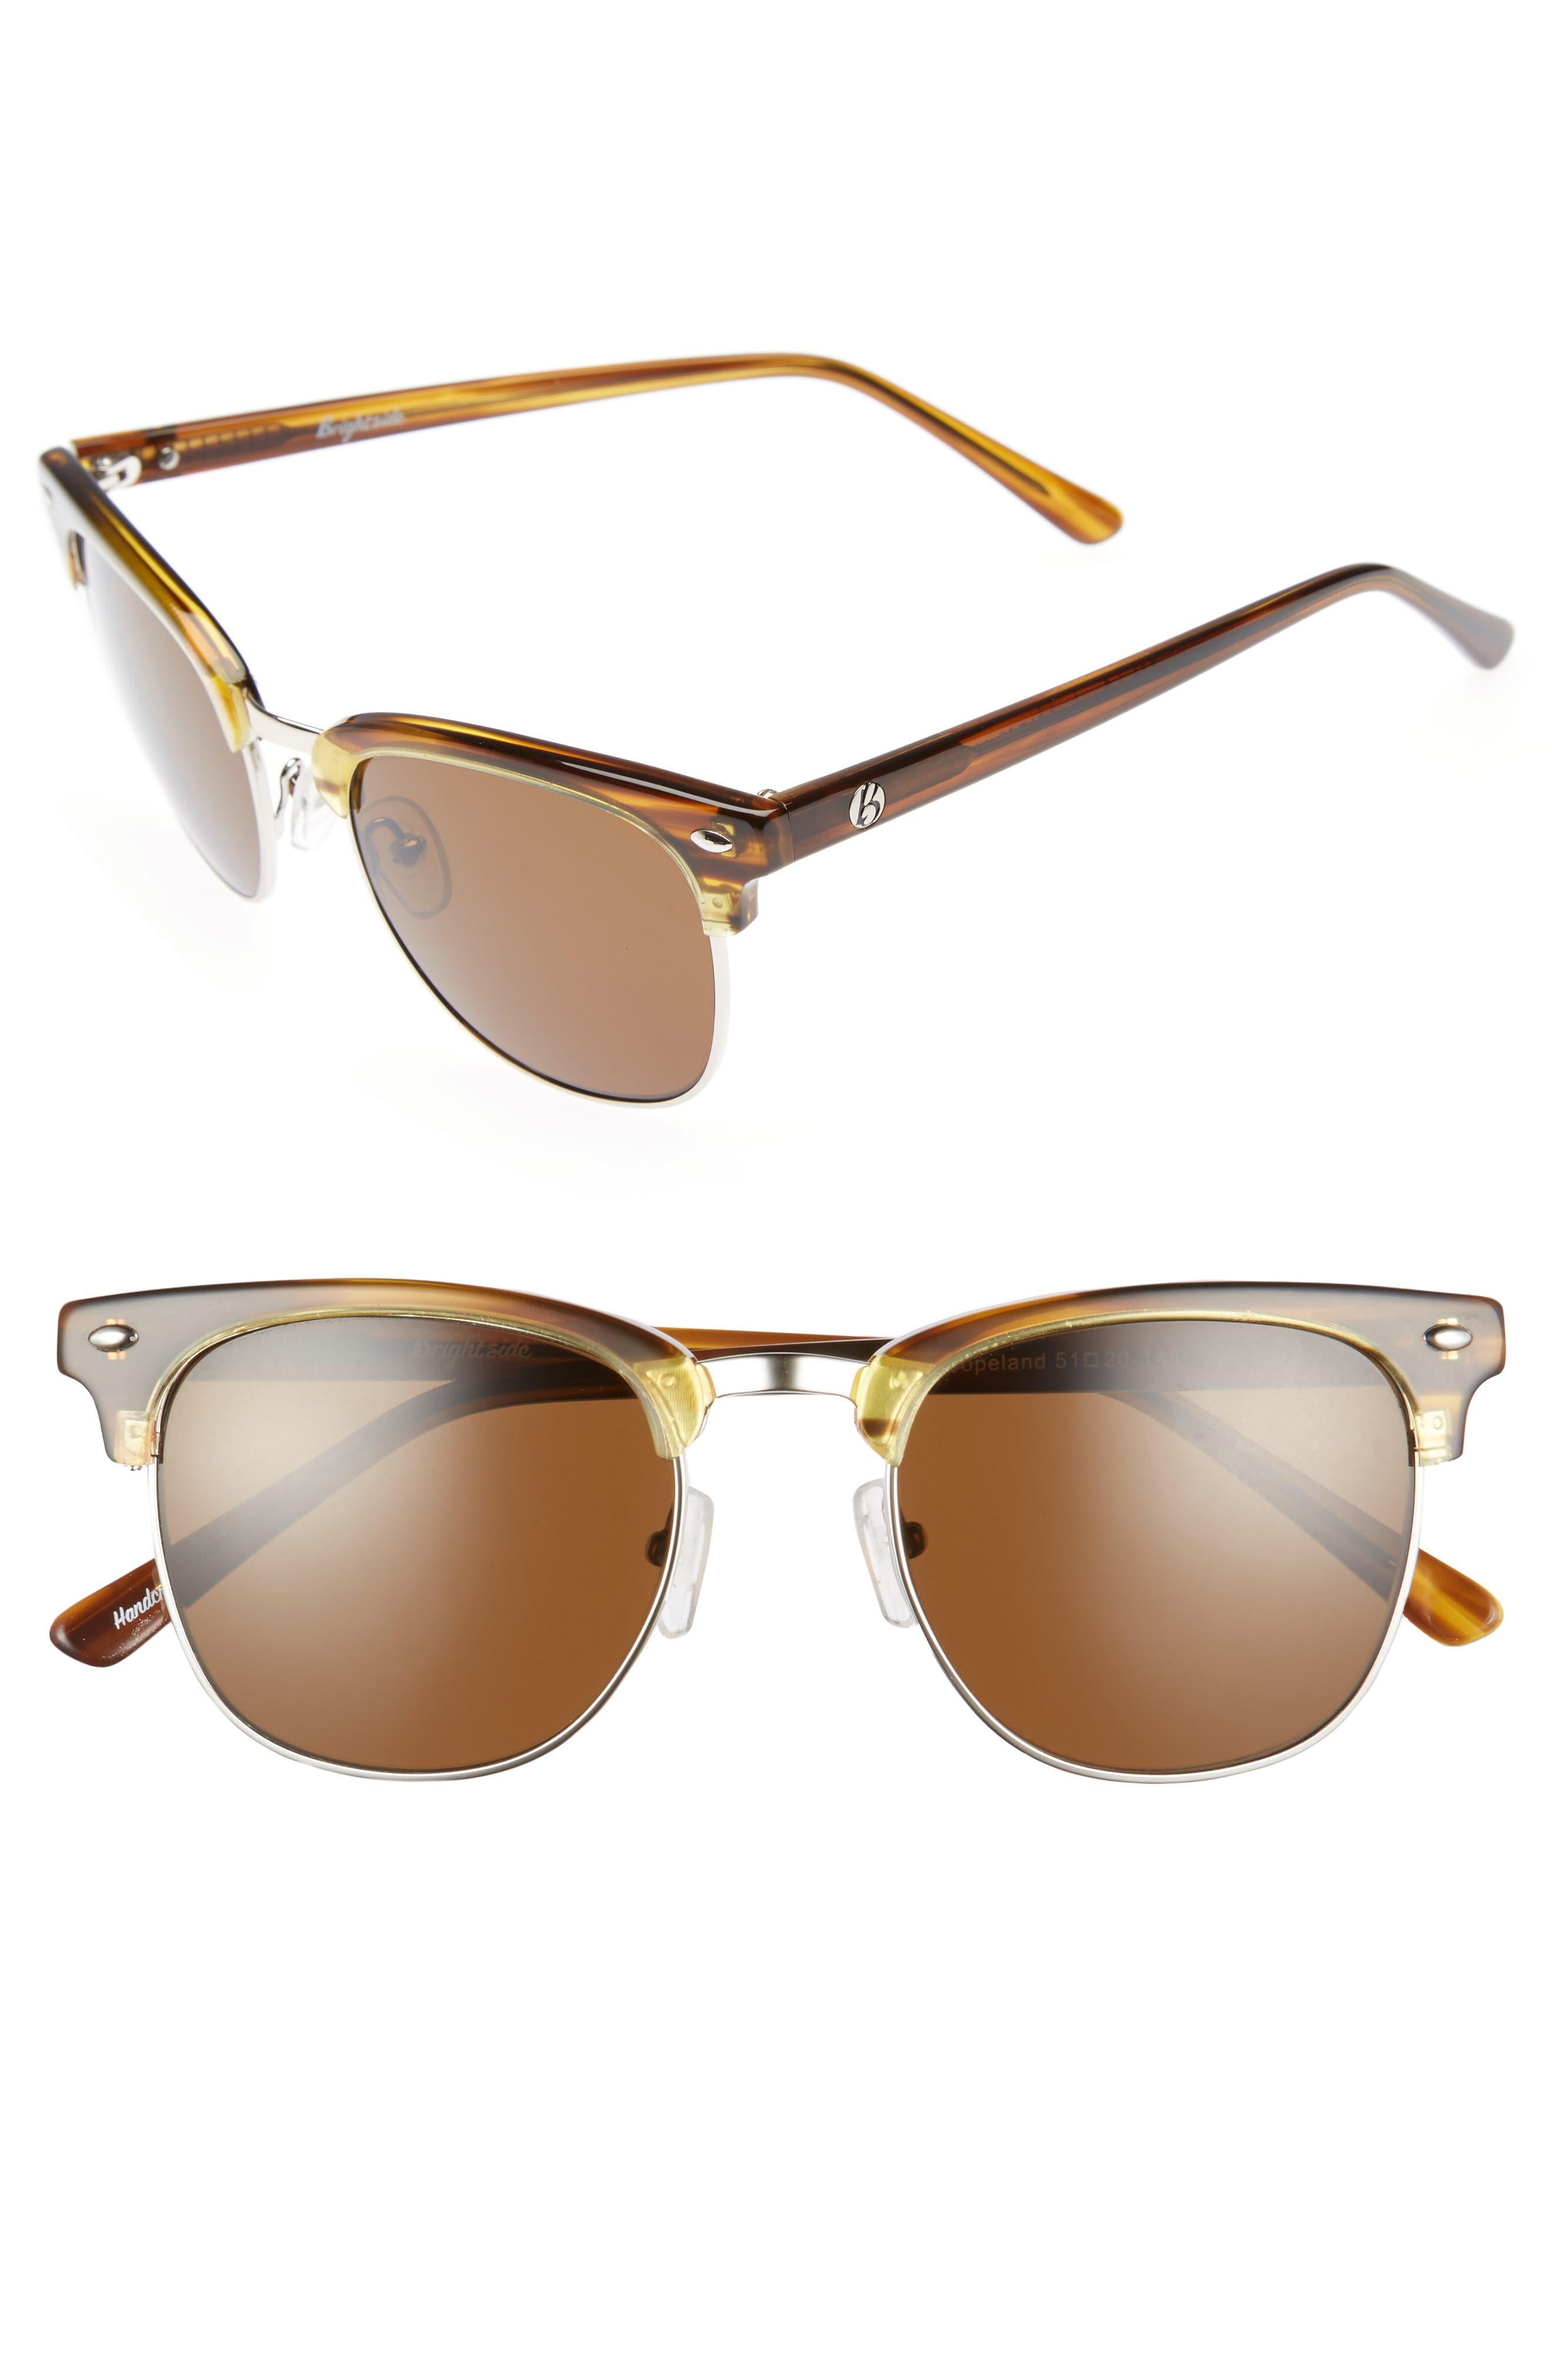 5fcf75e4e5314 Clubmaster Sunglasses for Women